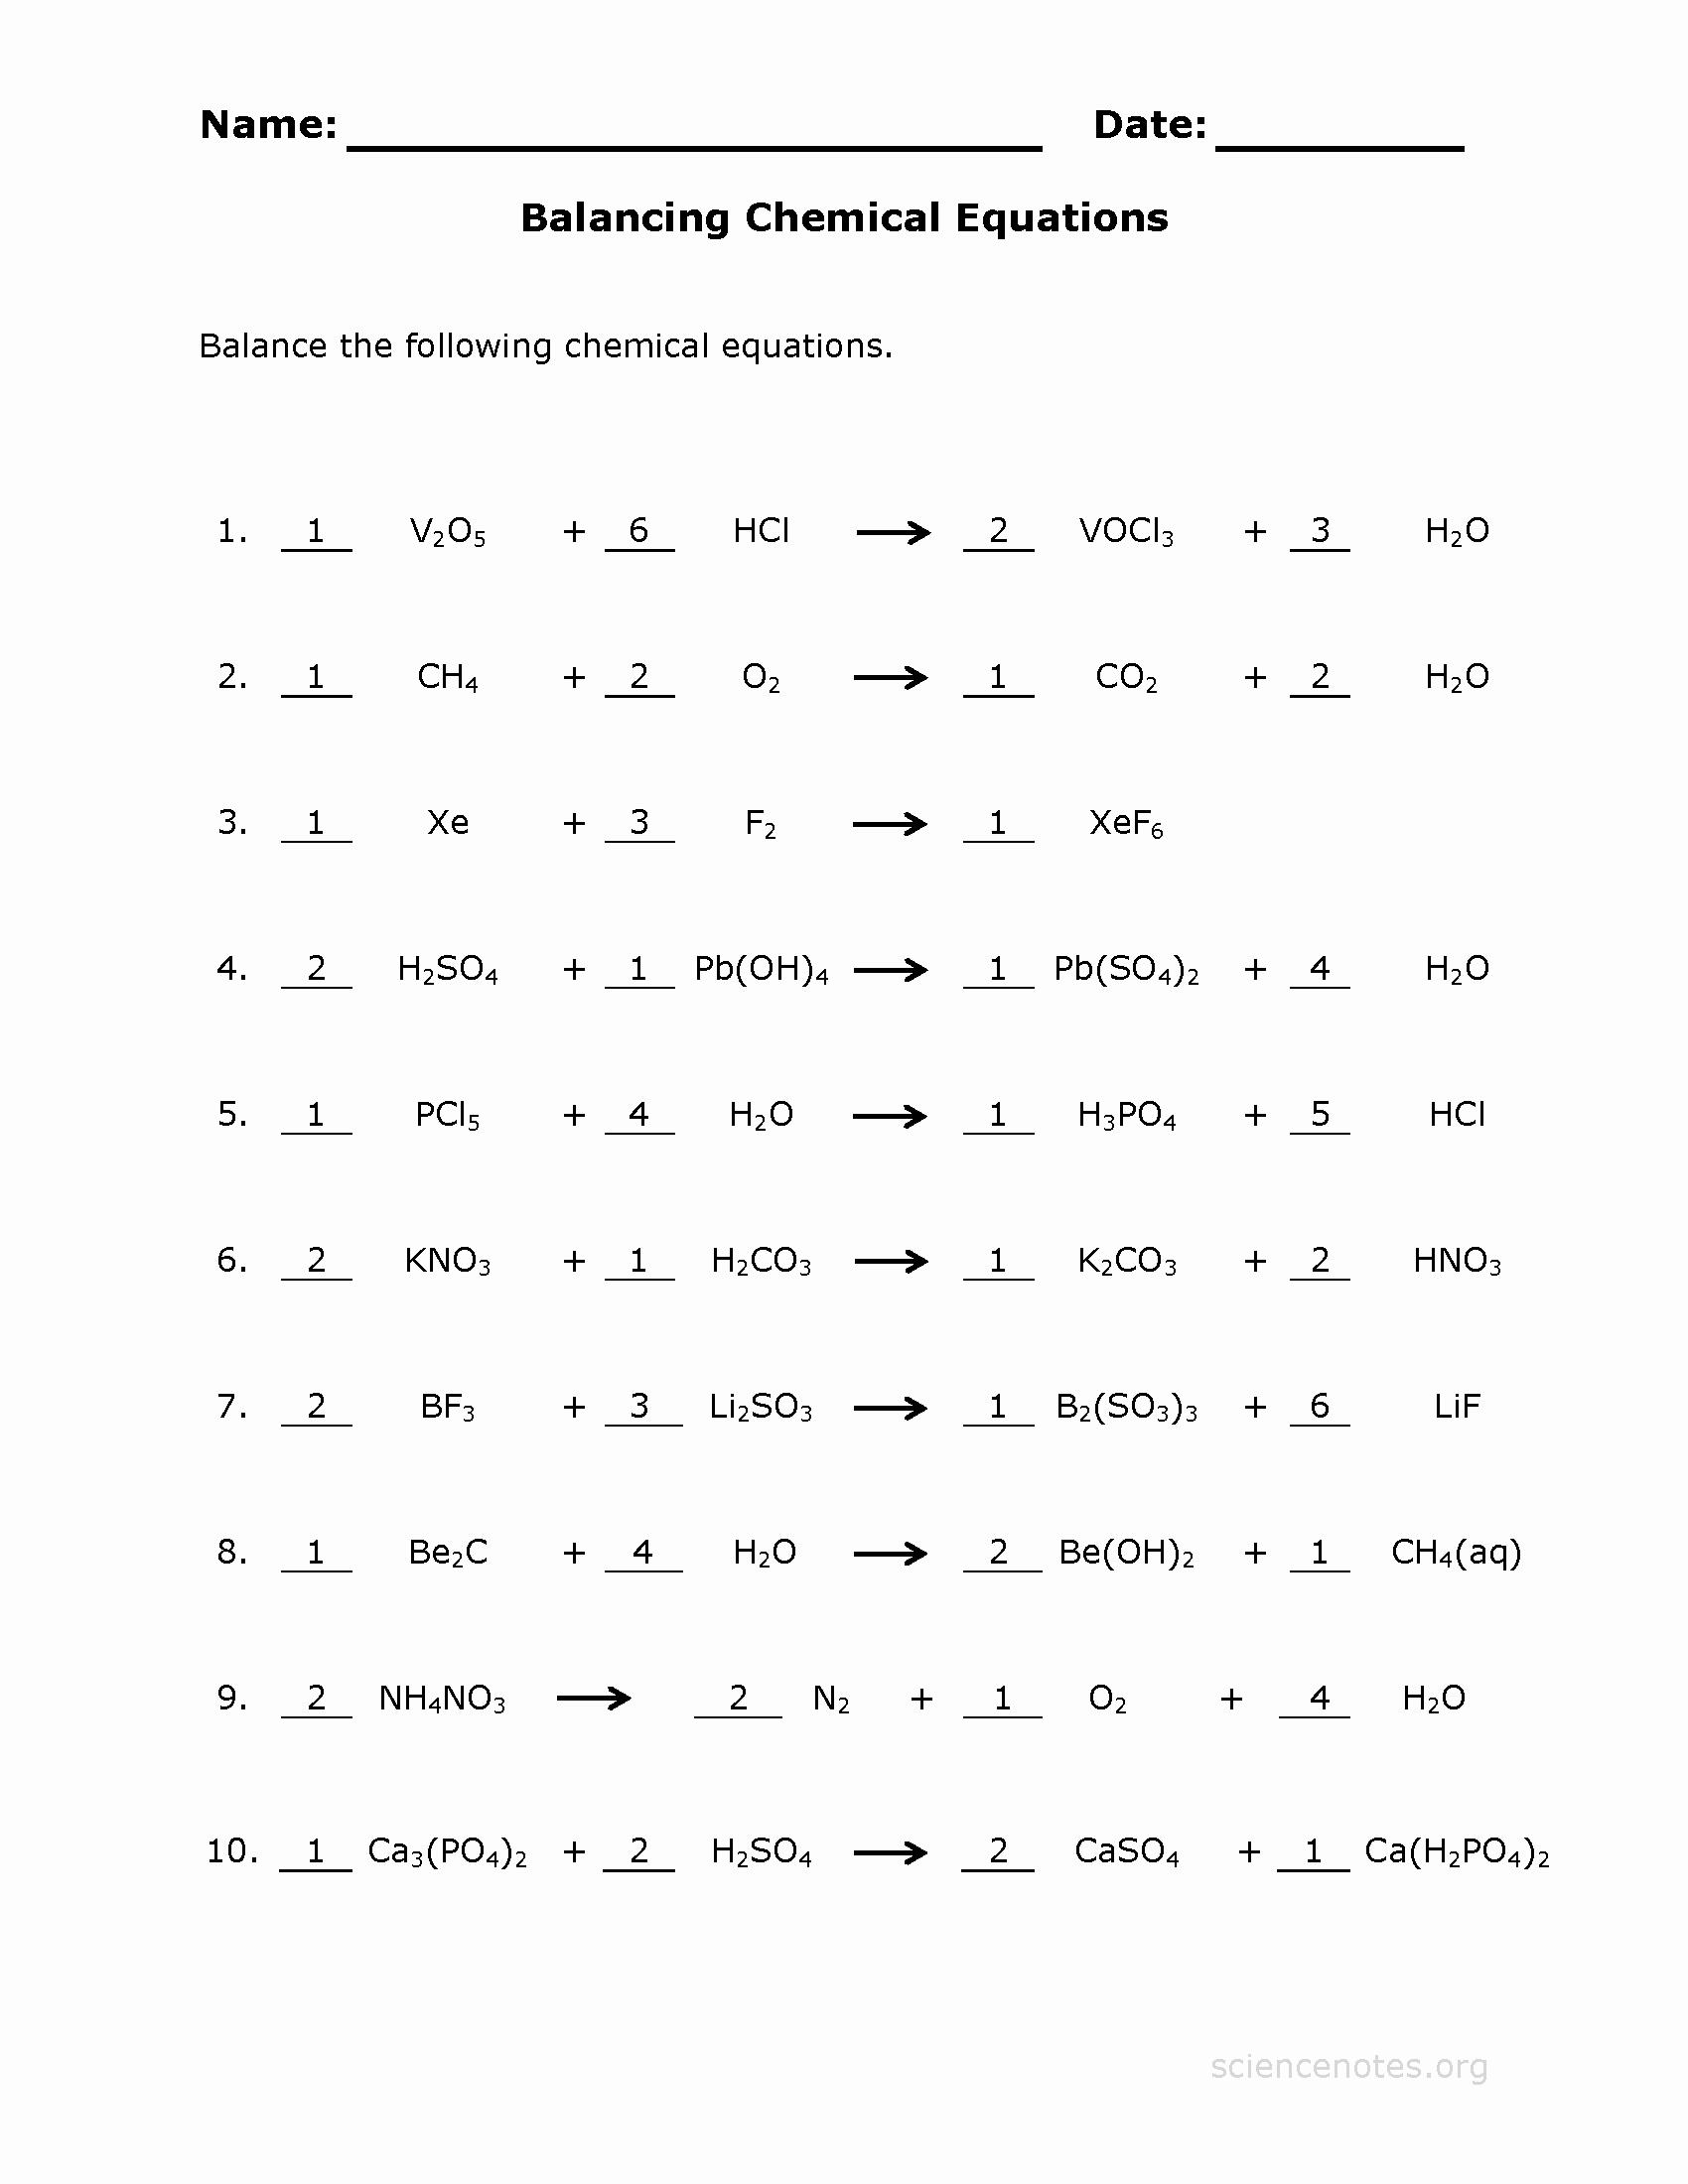 Nuclear Chemistry Worksheet K New Nuclear Chemistry Worksheet K Answers Elegant Super